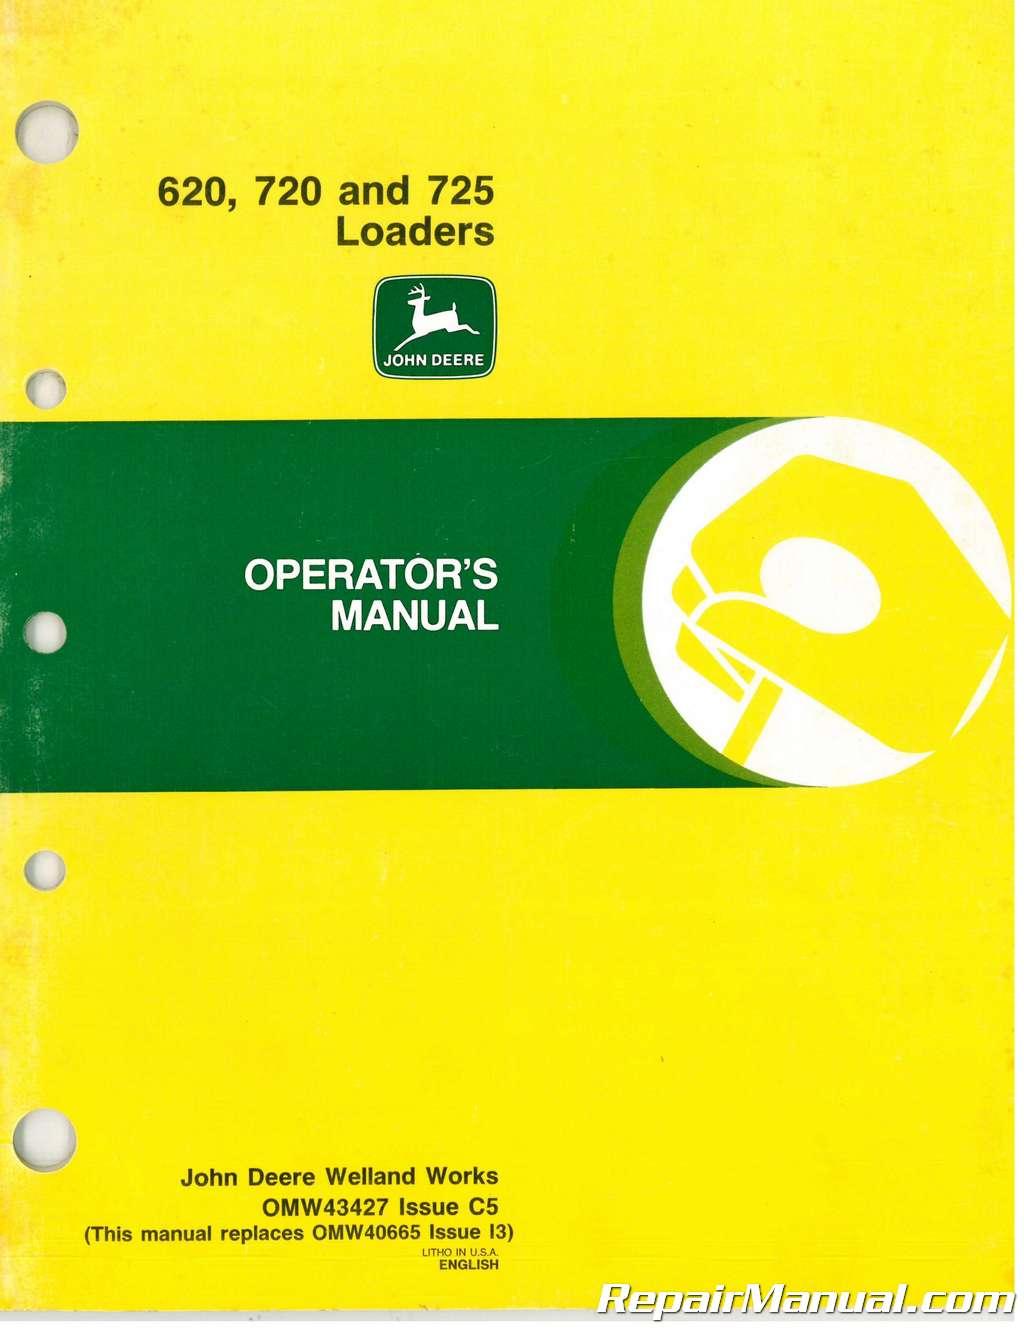 used john deere 620 720 725 loaders operators manual rh repairmanual com john deere 325 service manual pdf john deere 325 service manual